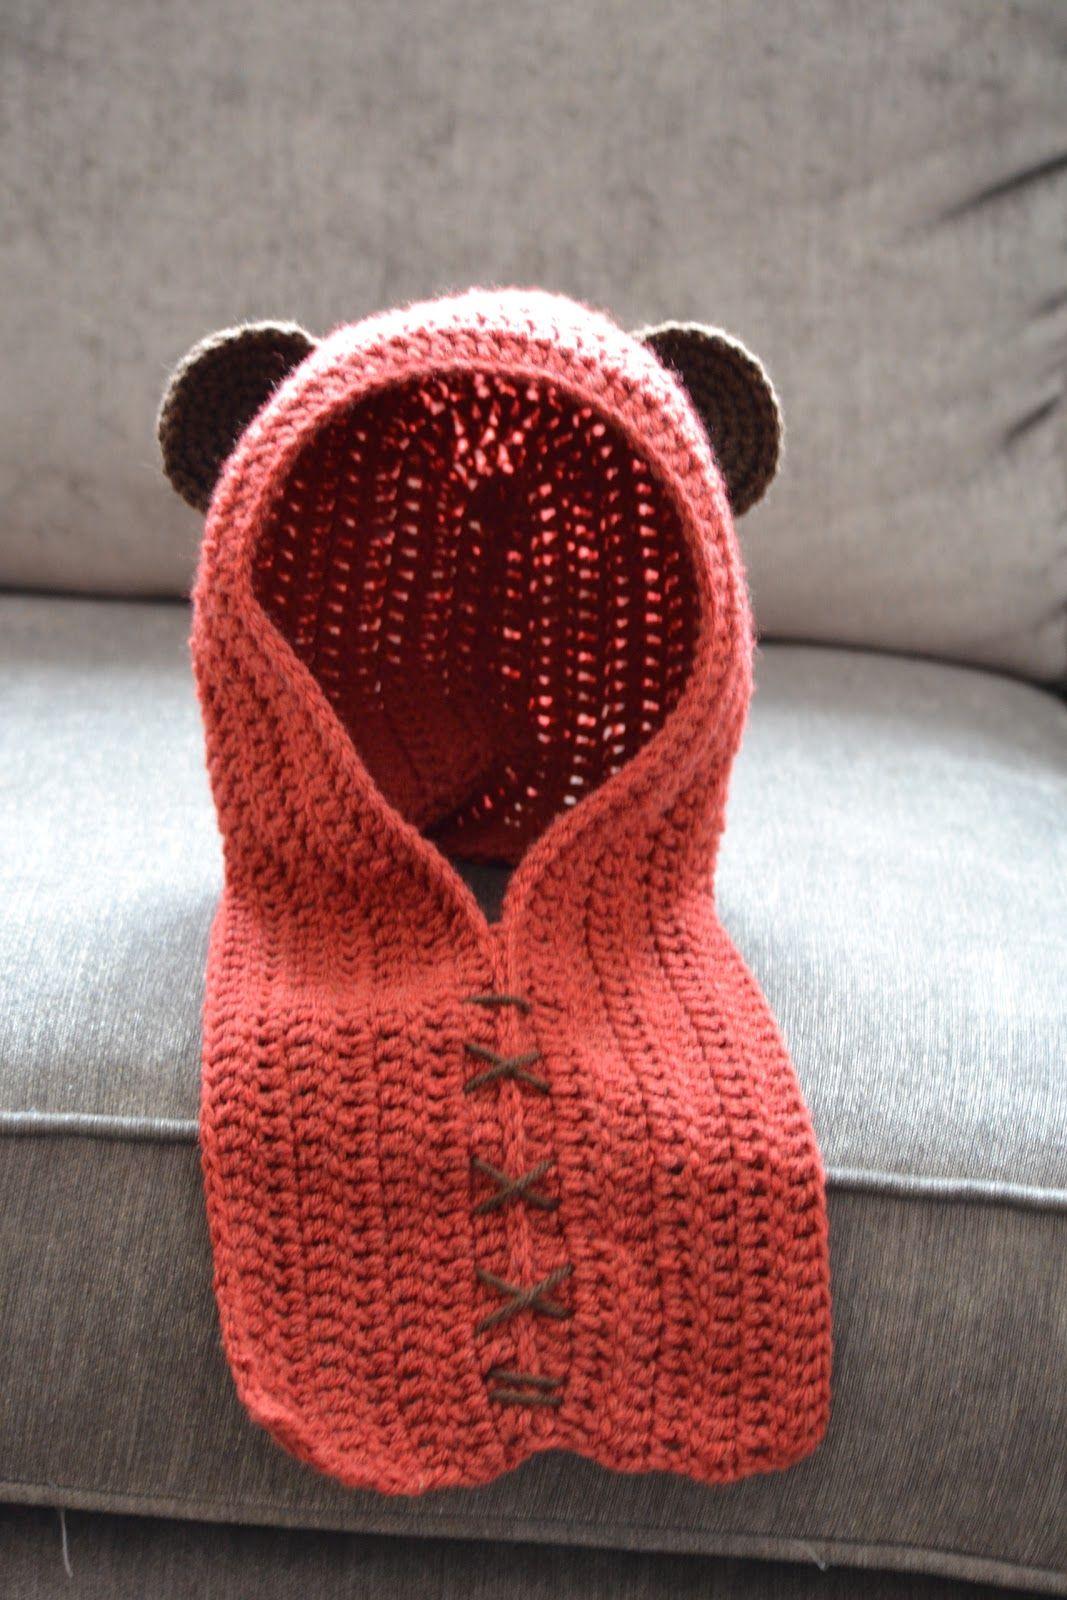 Knotty Knotty Crochet: EWOK hat free pattern link | Crochet ...